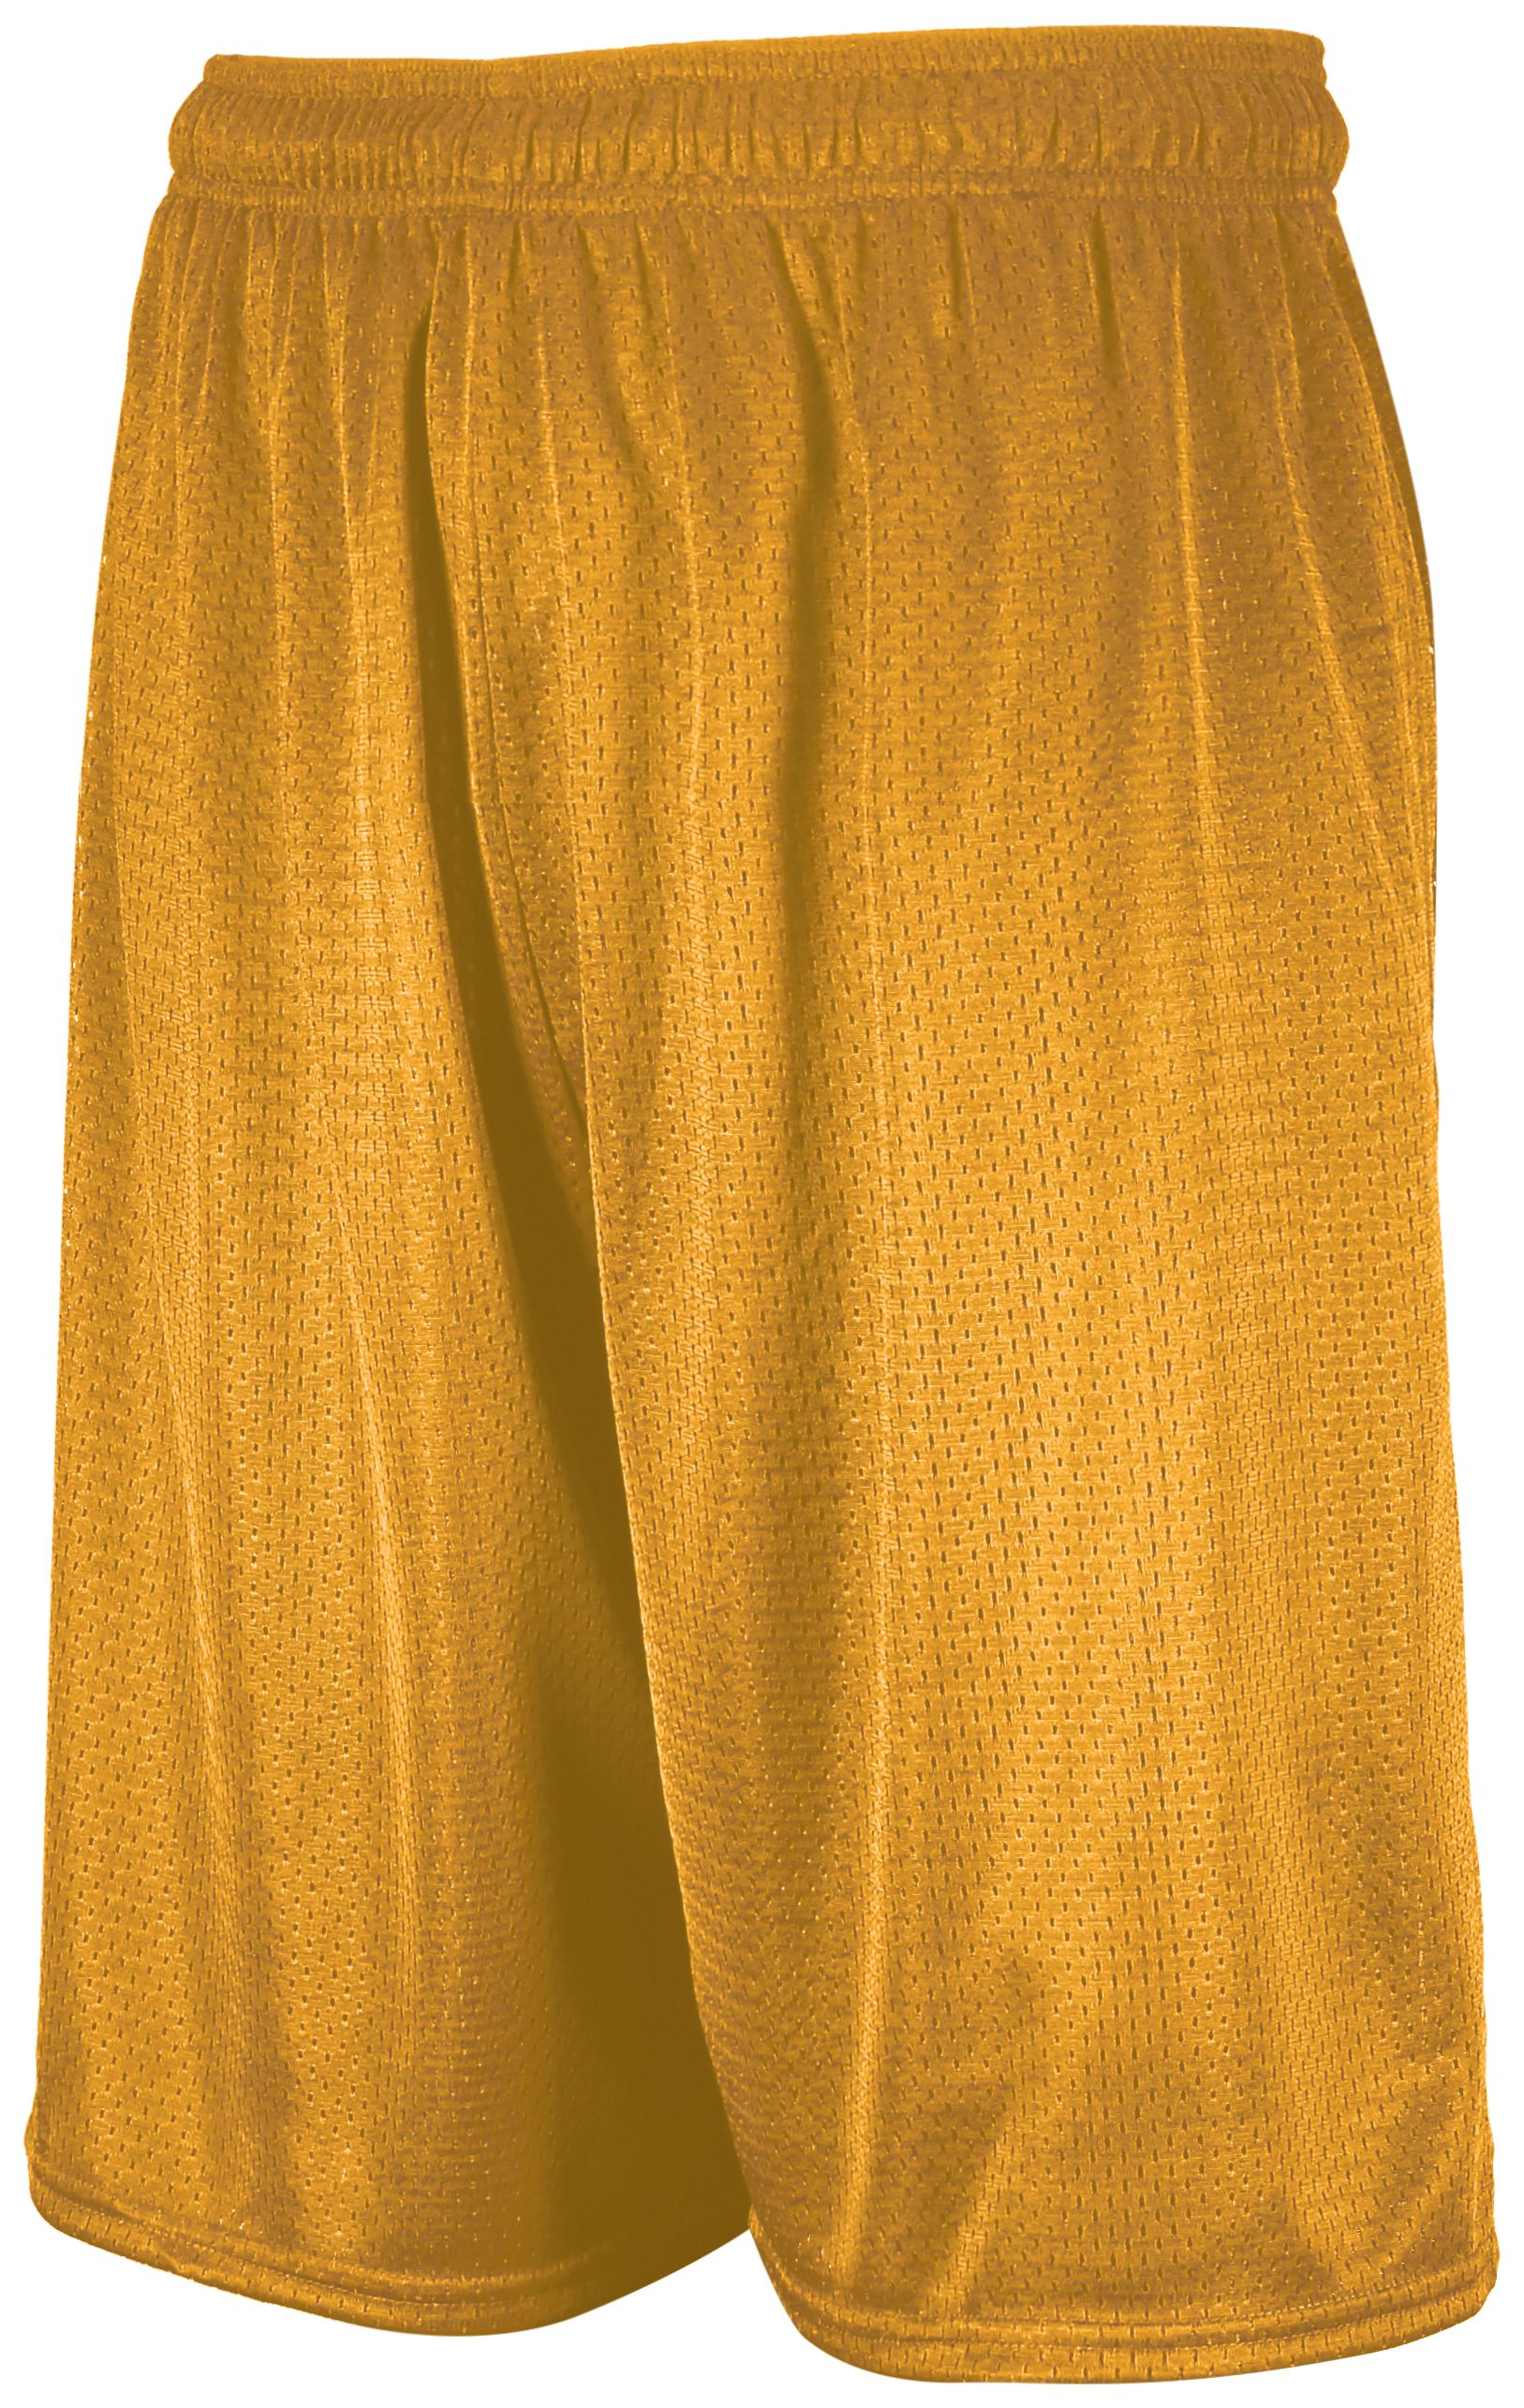 Dri-Power Mesh Shorts - Gold